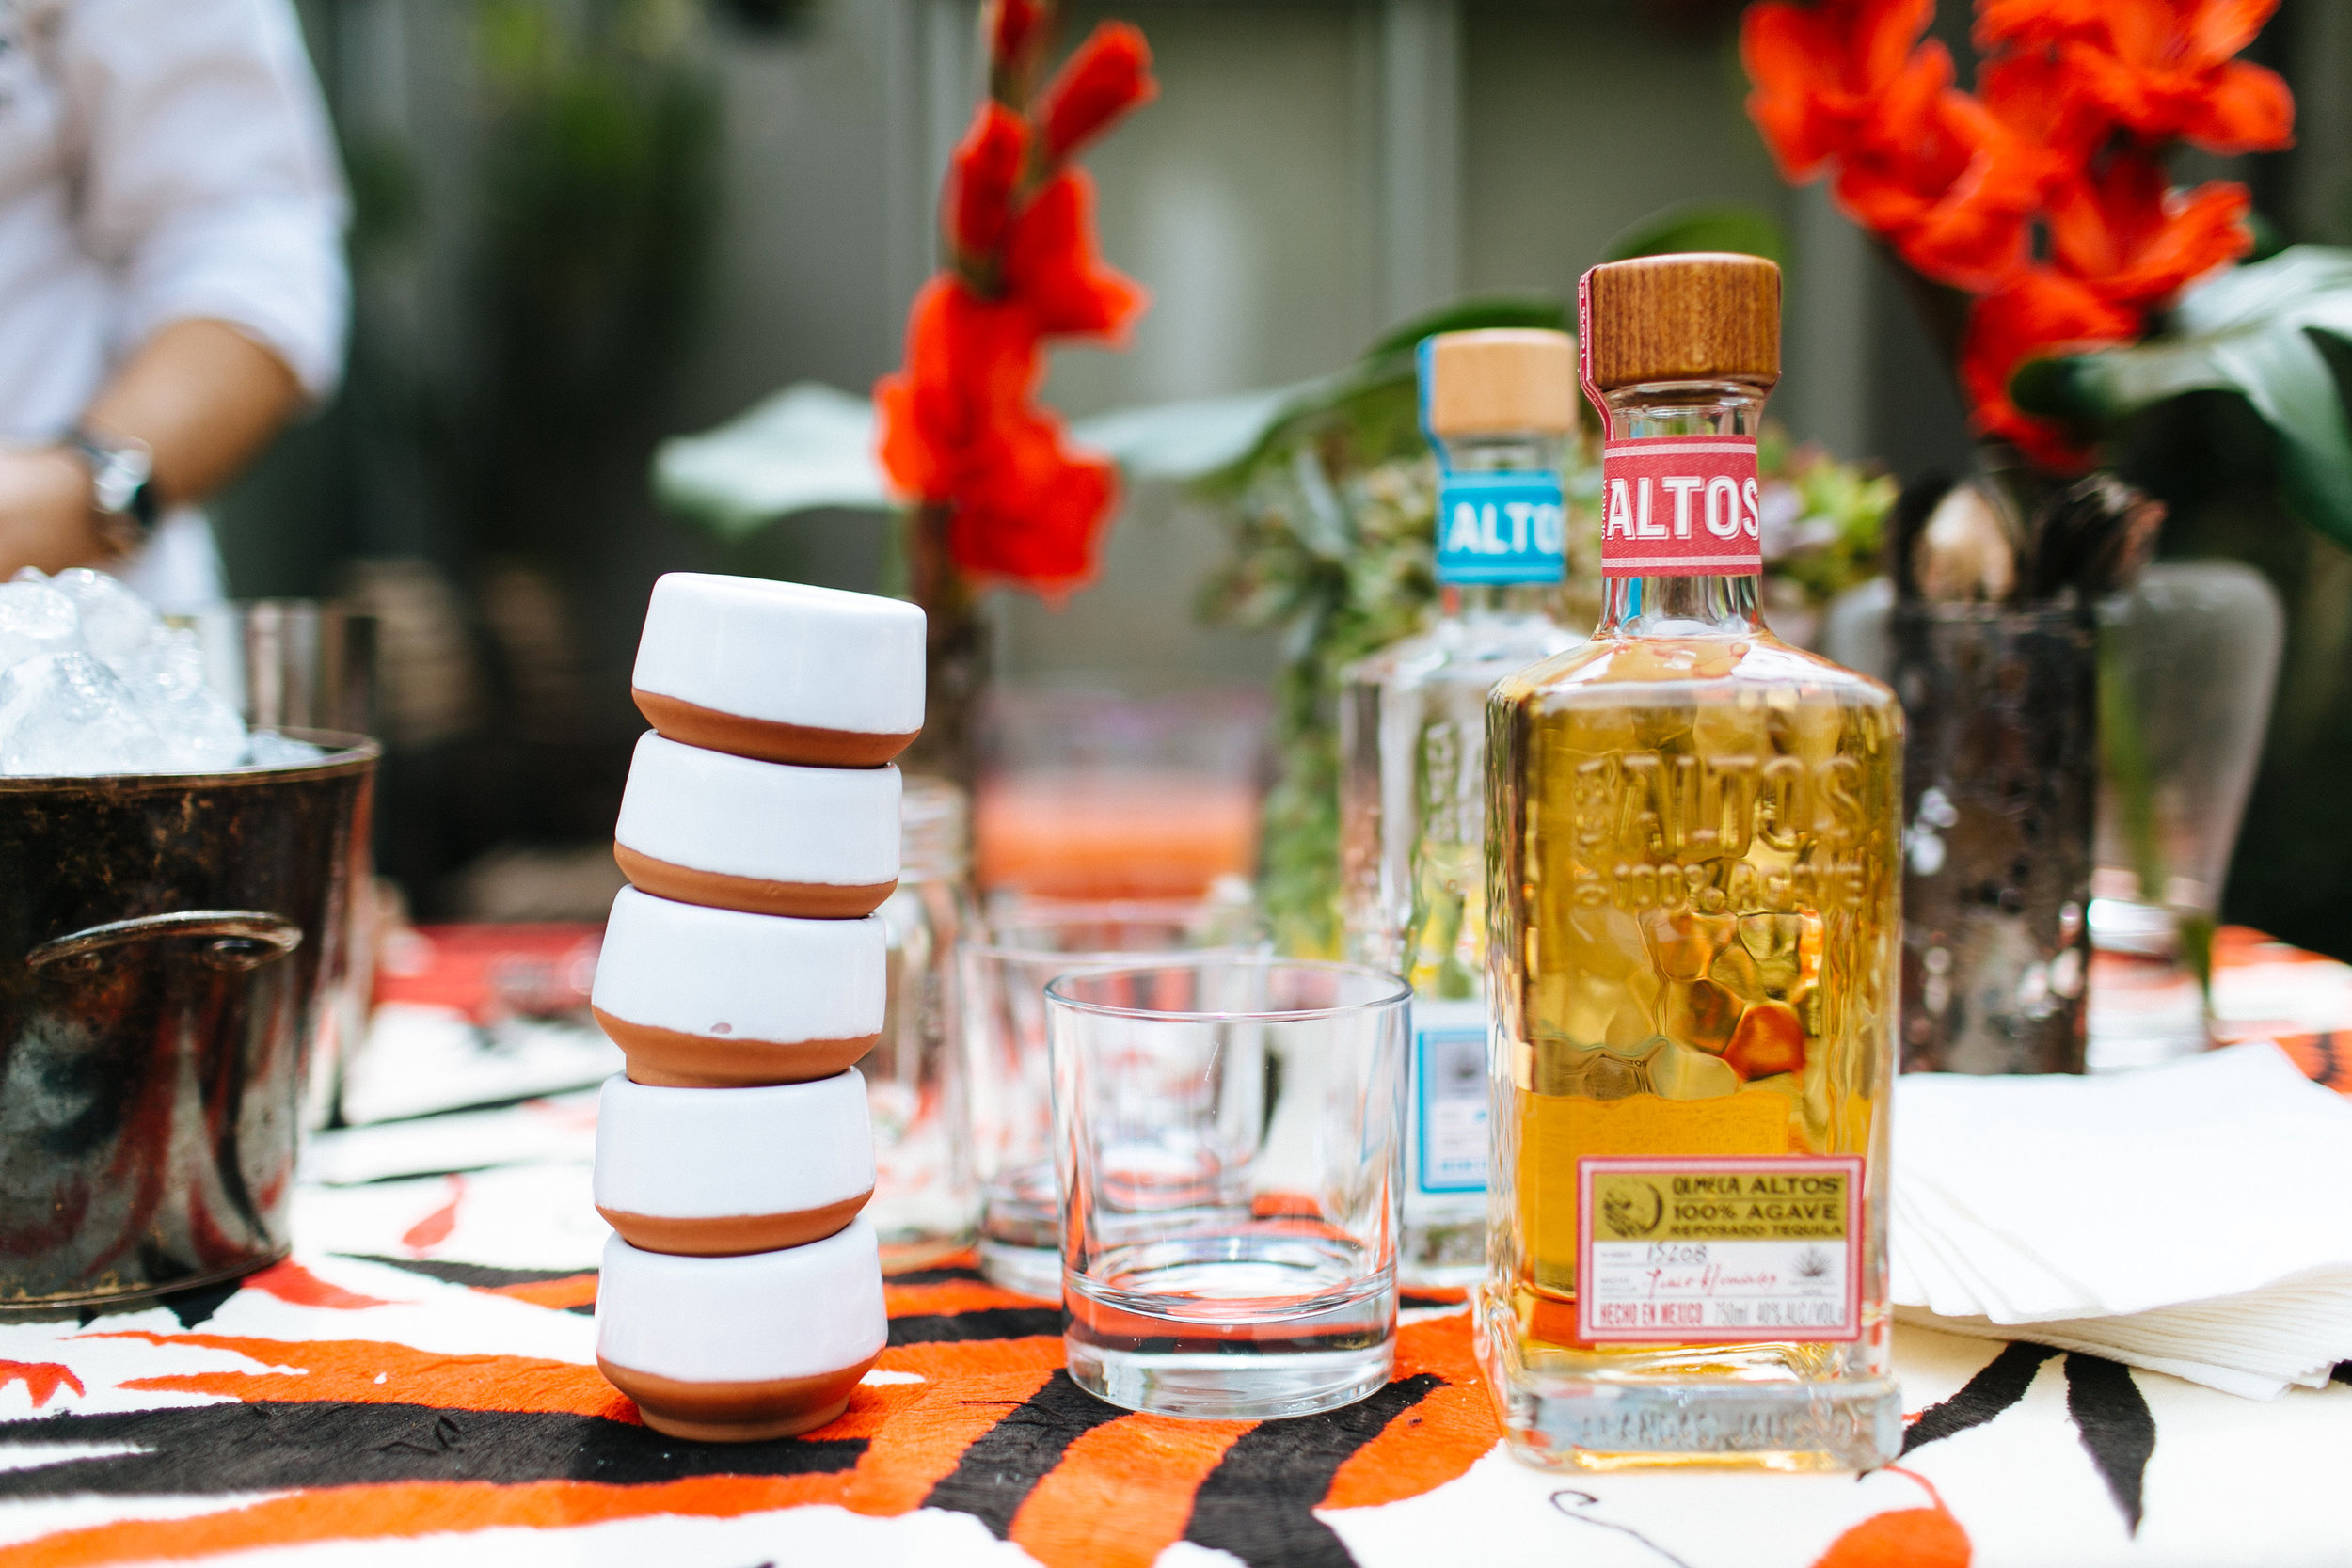 Copy of Bottle of Altos tequila